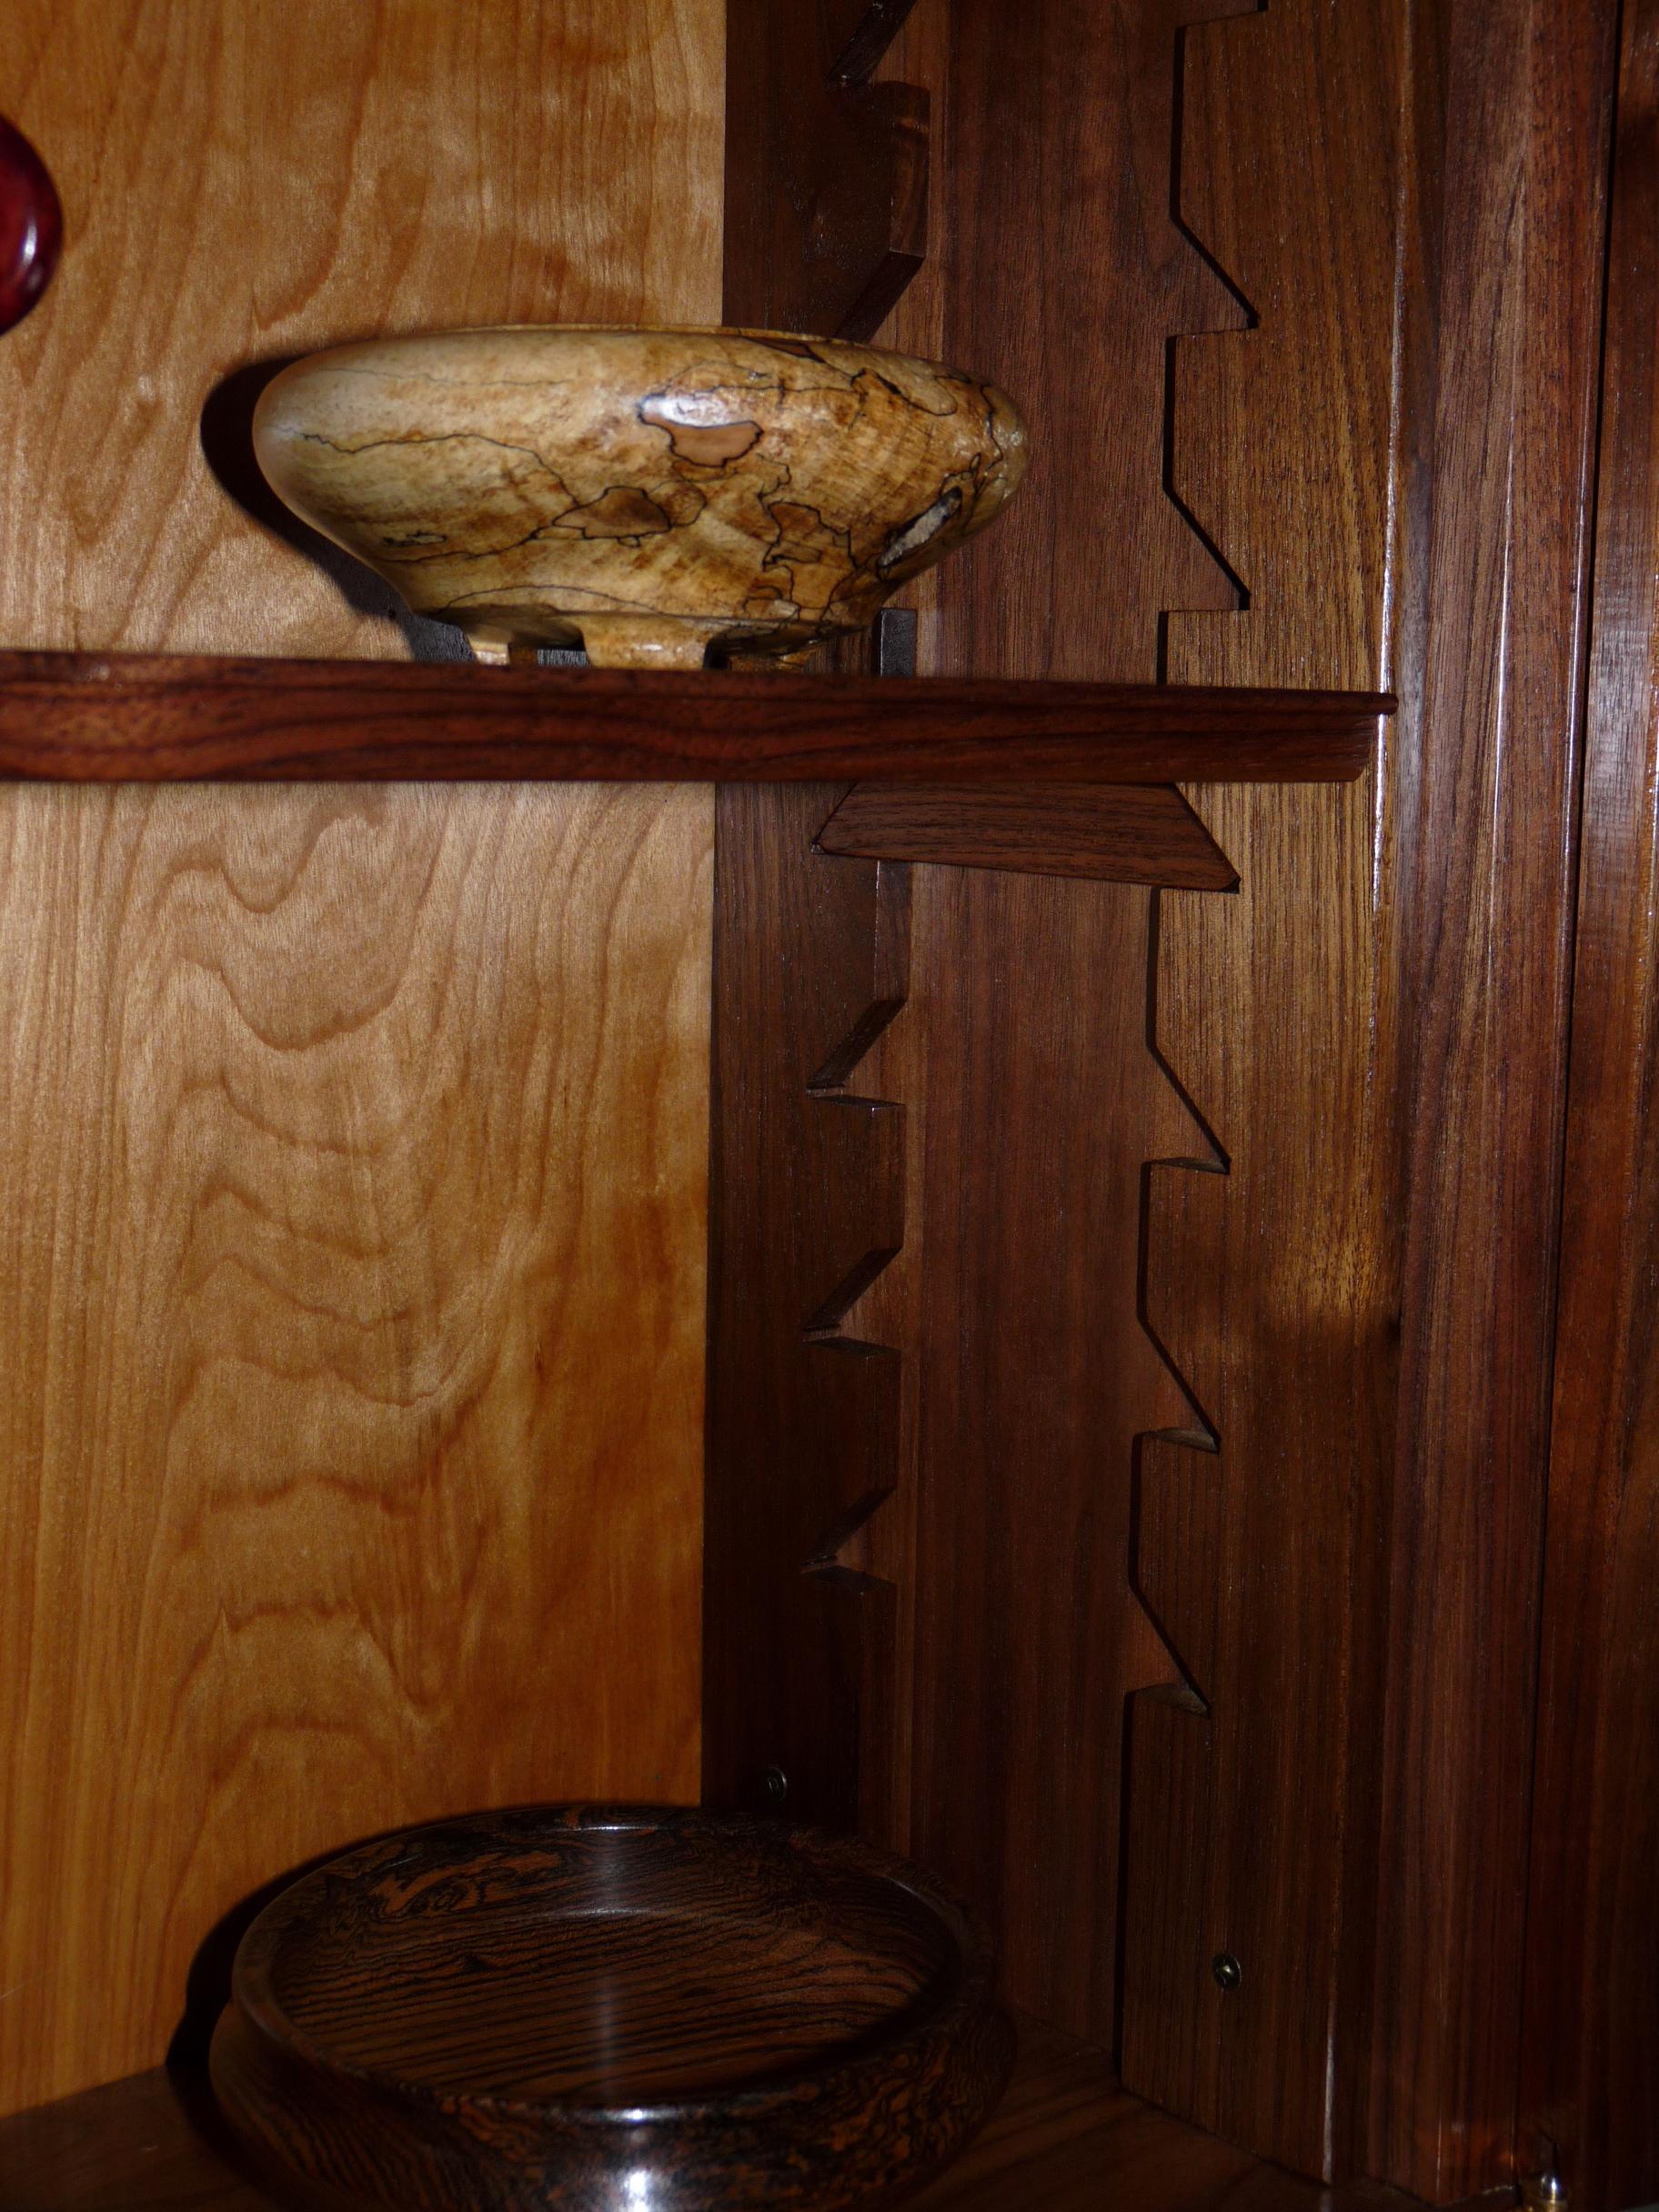 Adjustable shelf supports